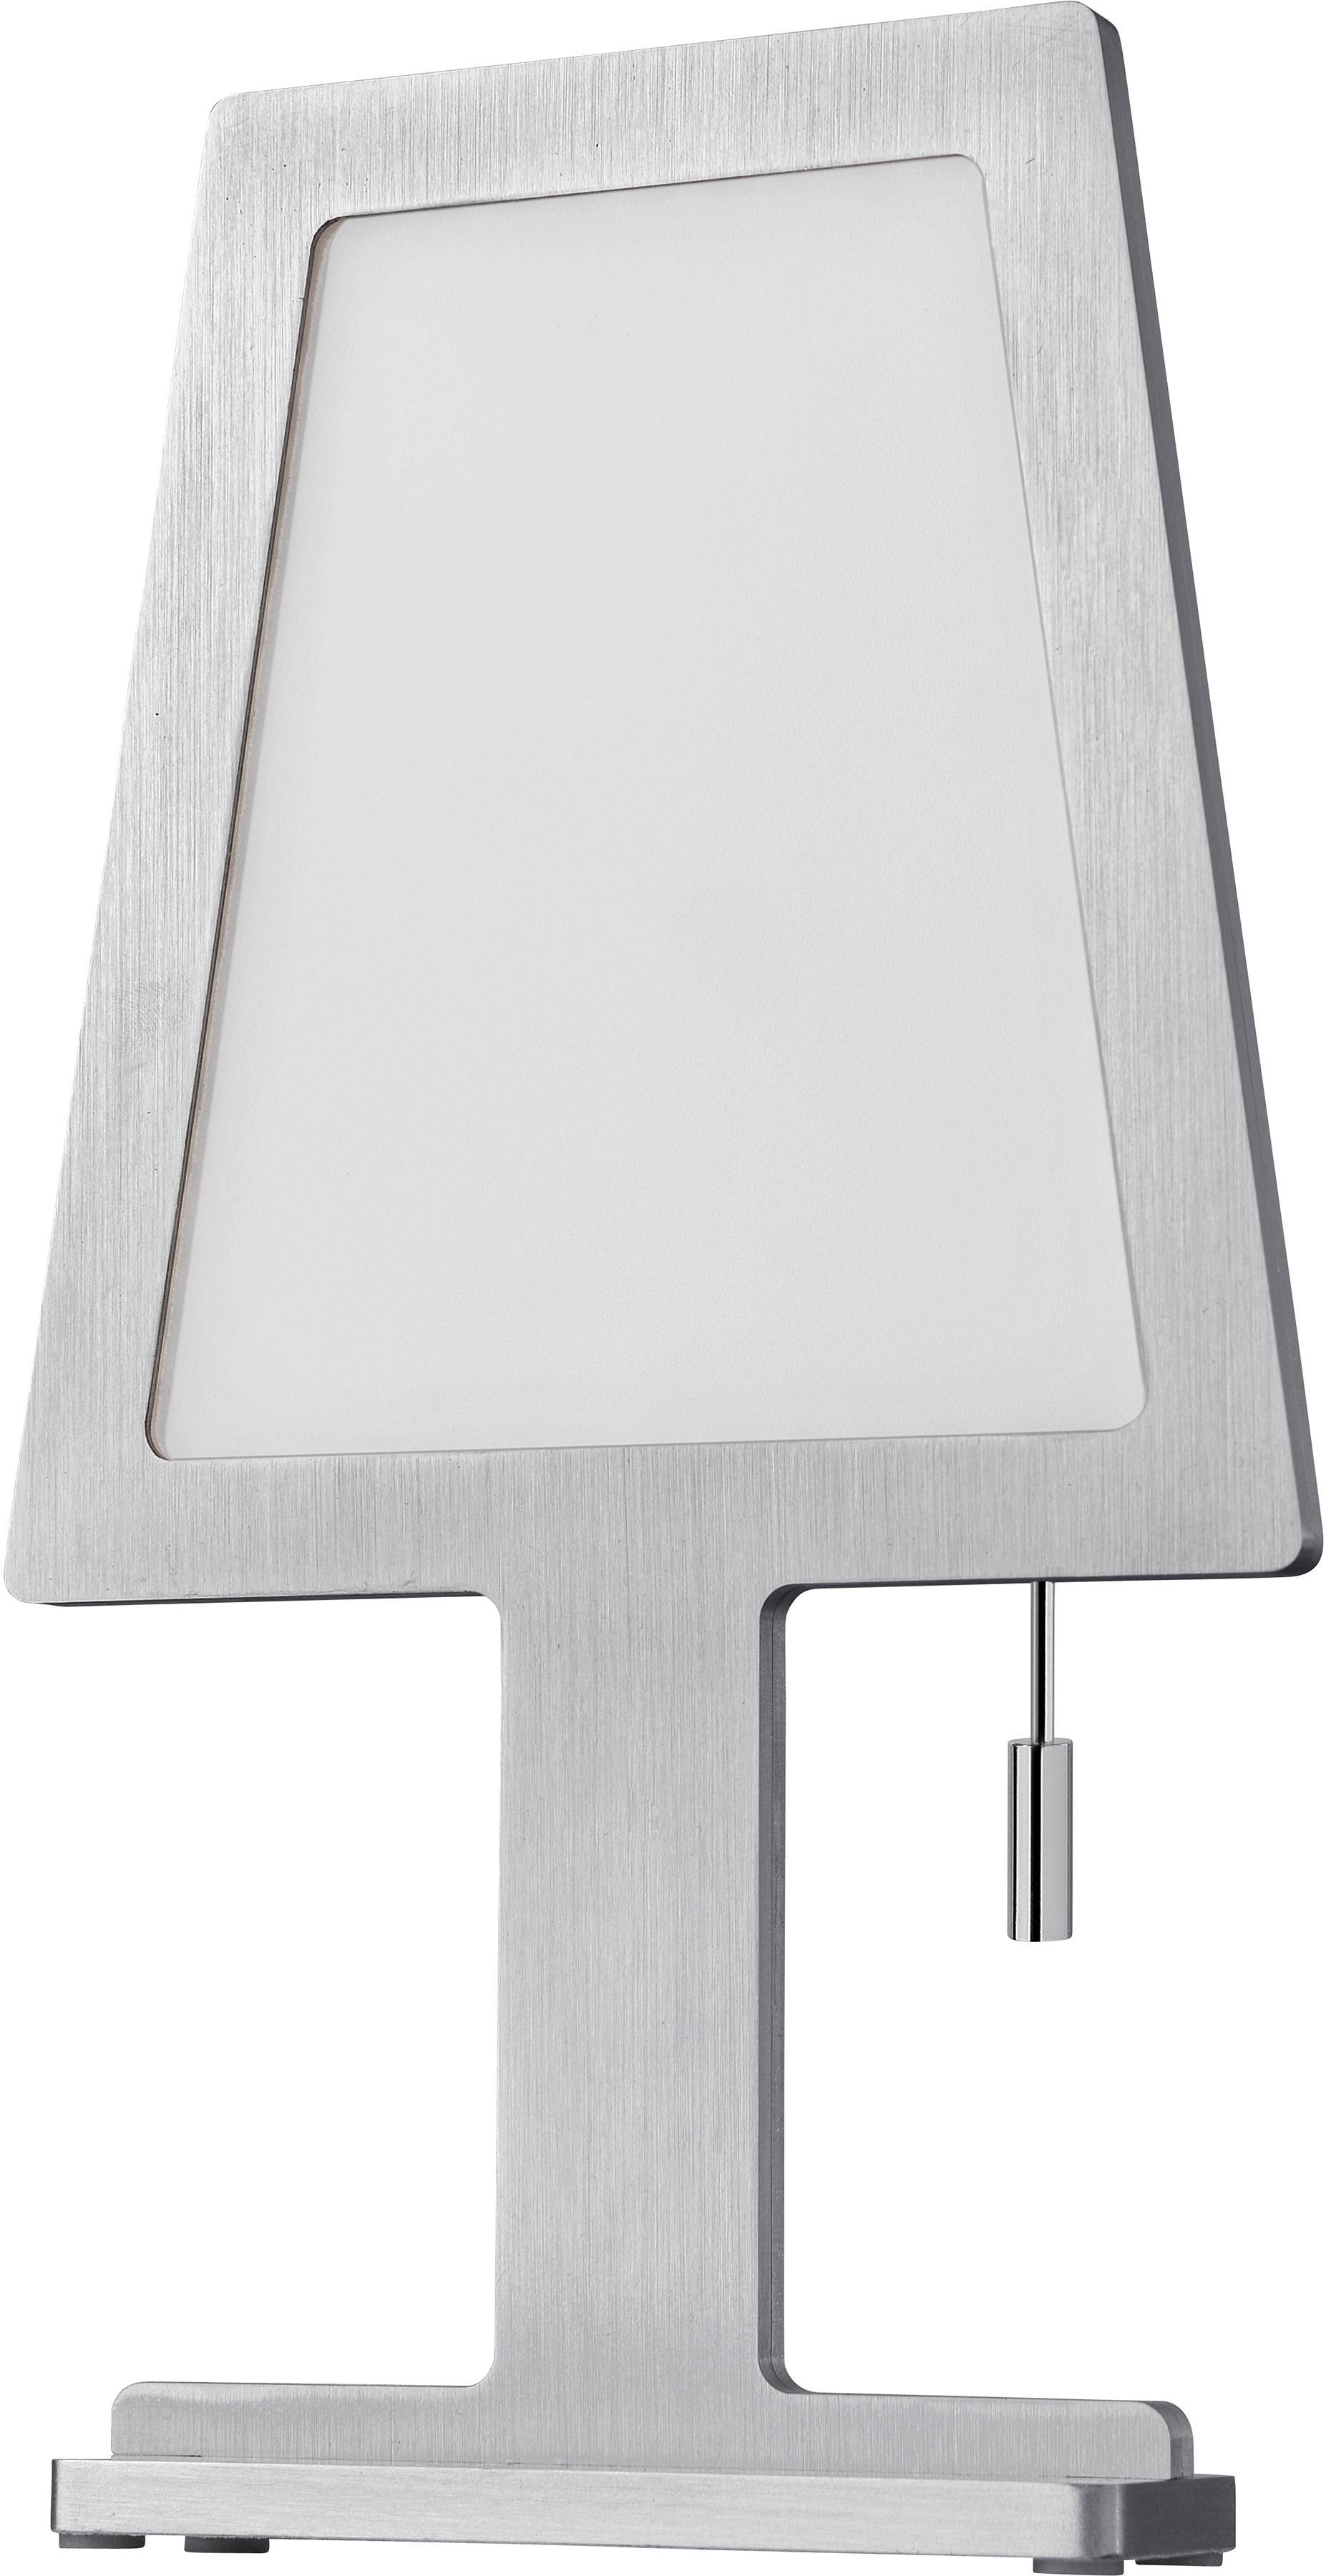 SOMPEX LED Tischleuchte Steve, LED-Board, Warmweiß